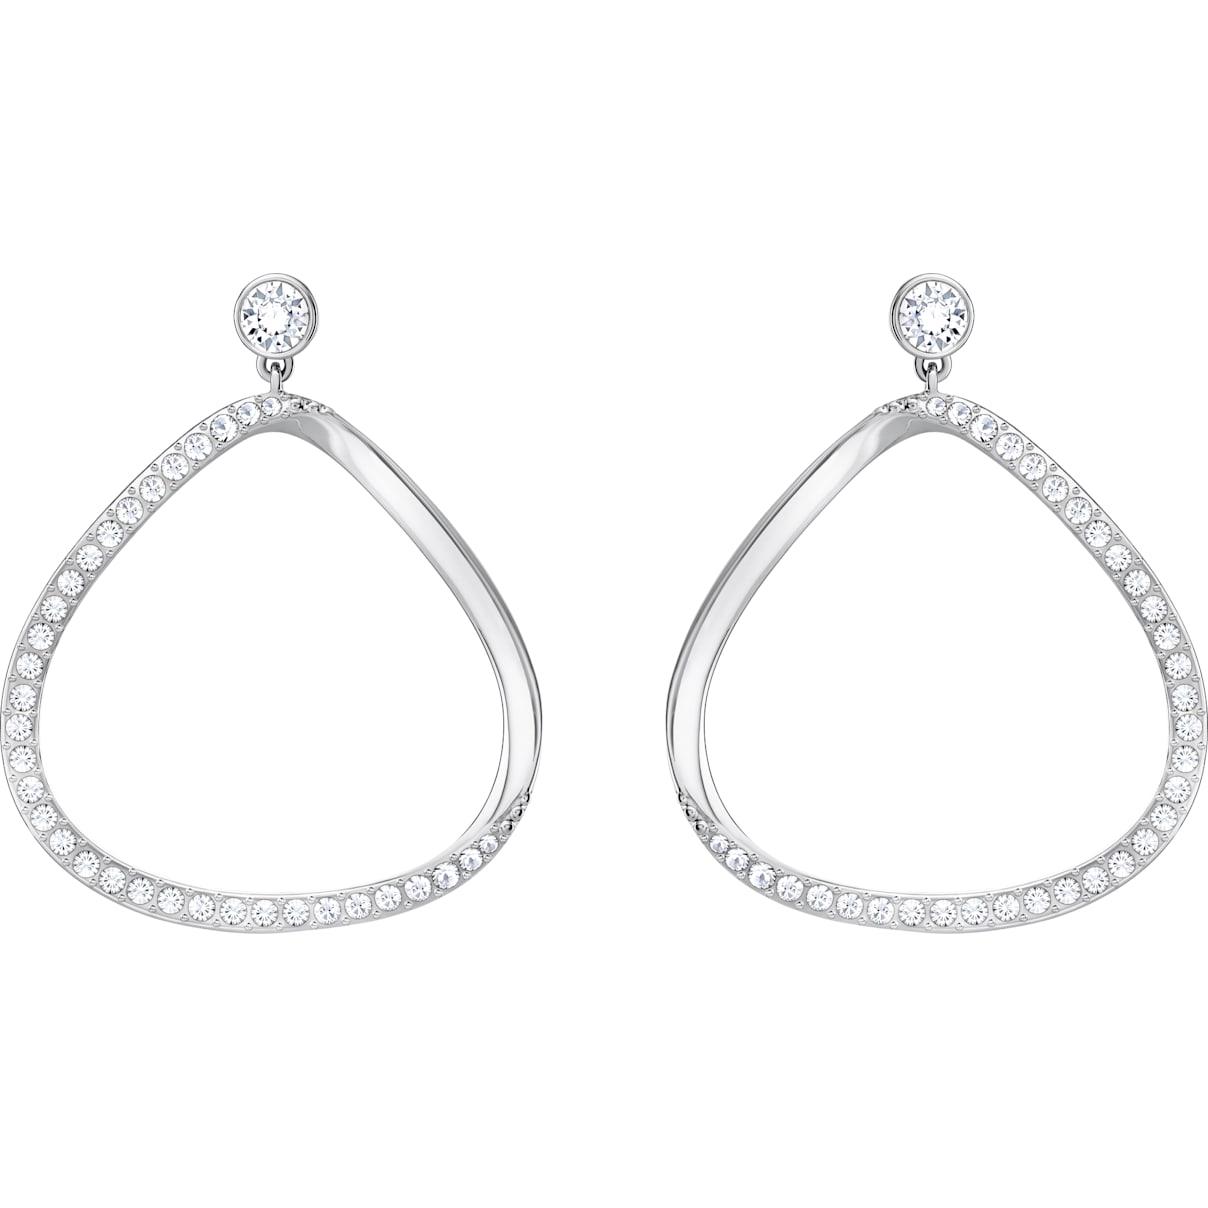 Swarovski Gaya Pierced Earrings, White, Rhodium Plating